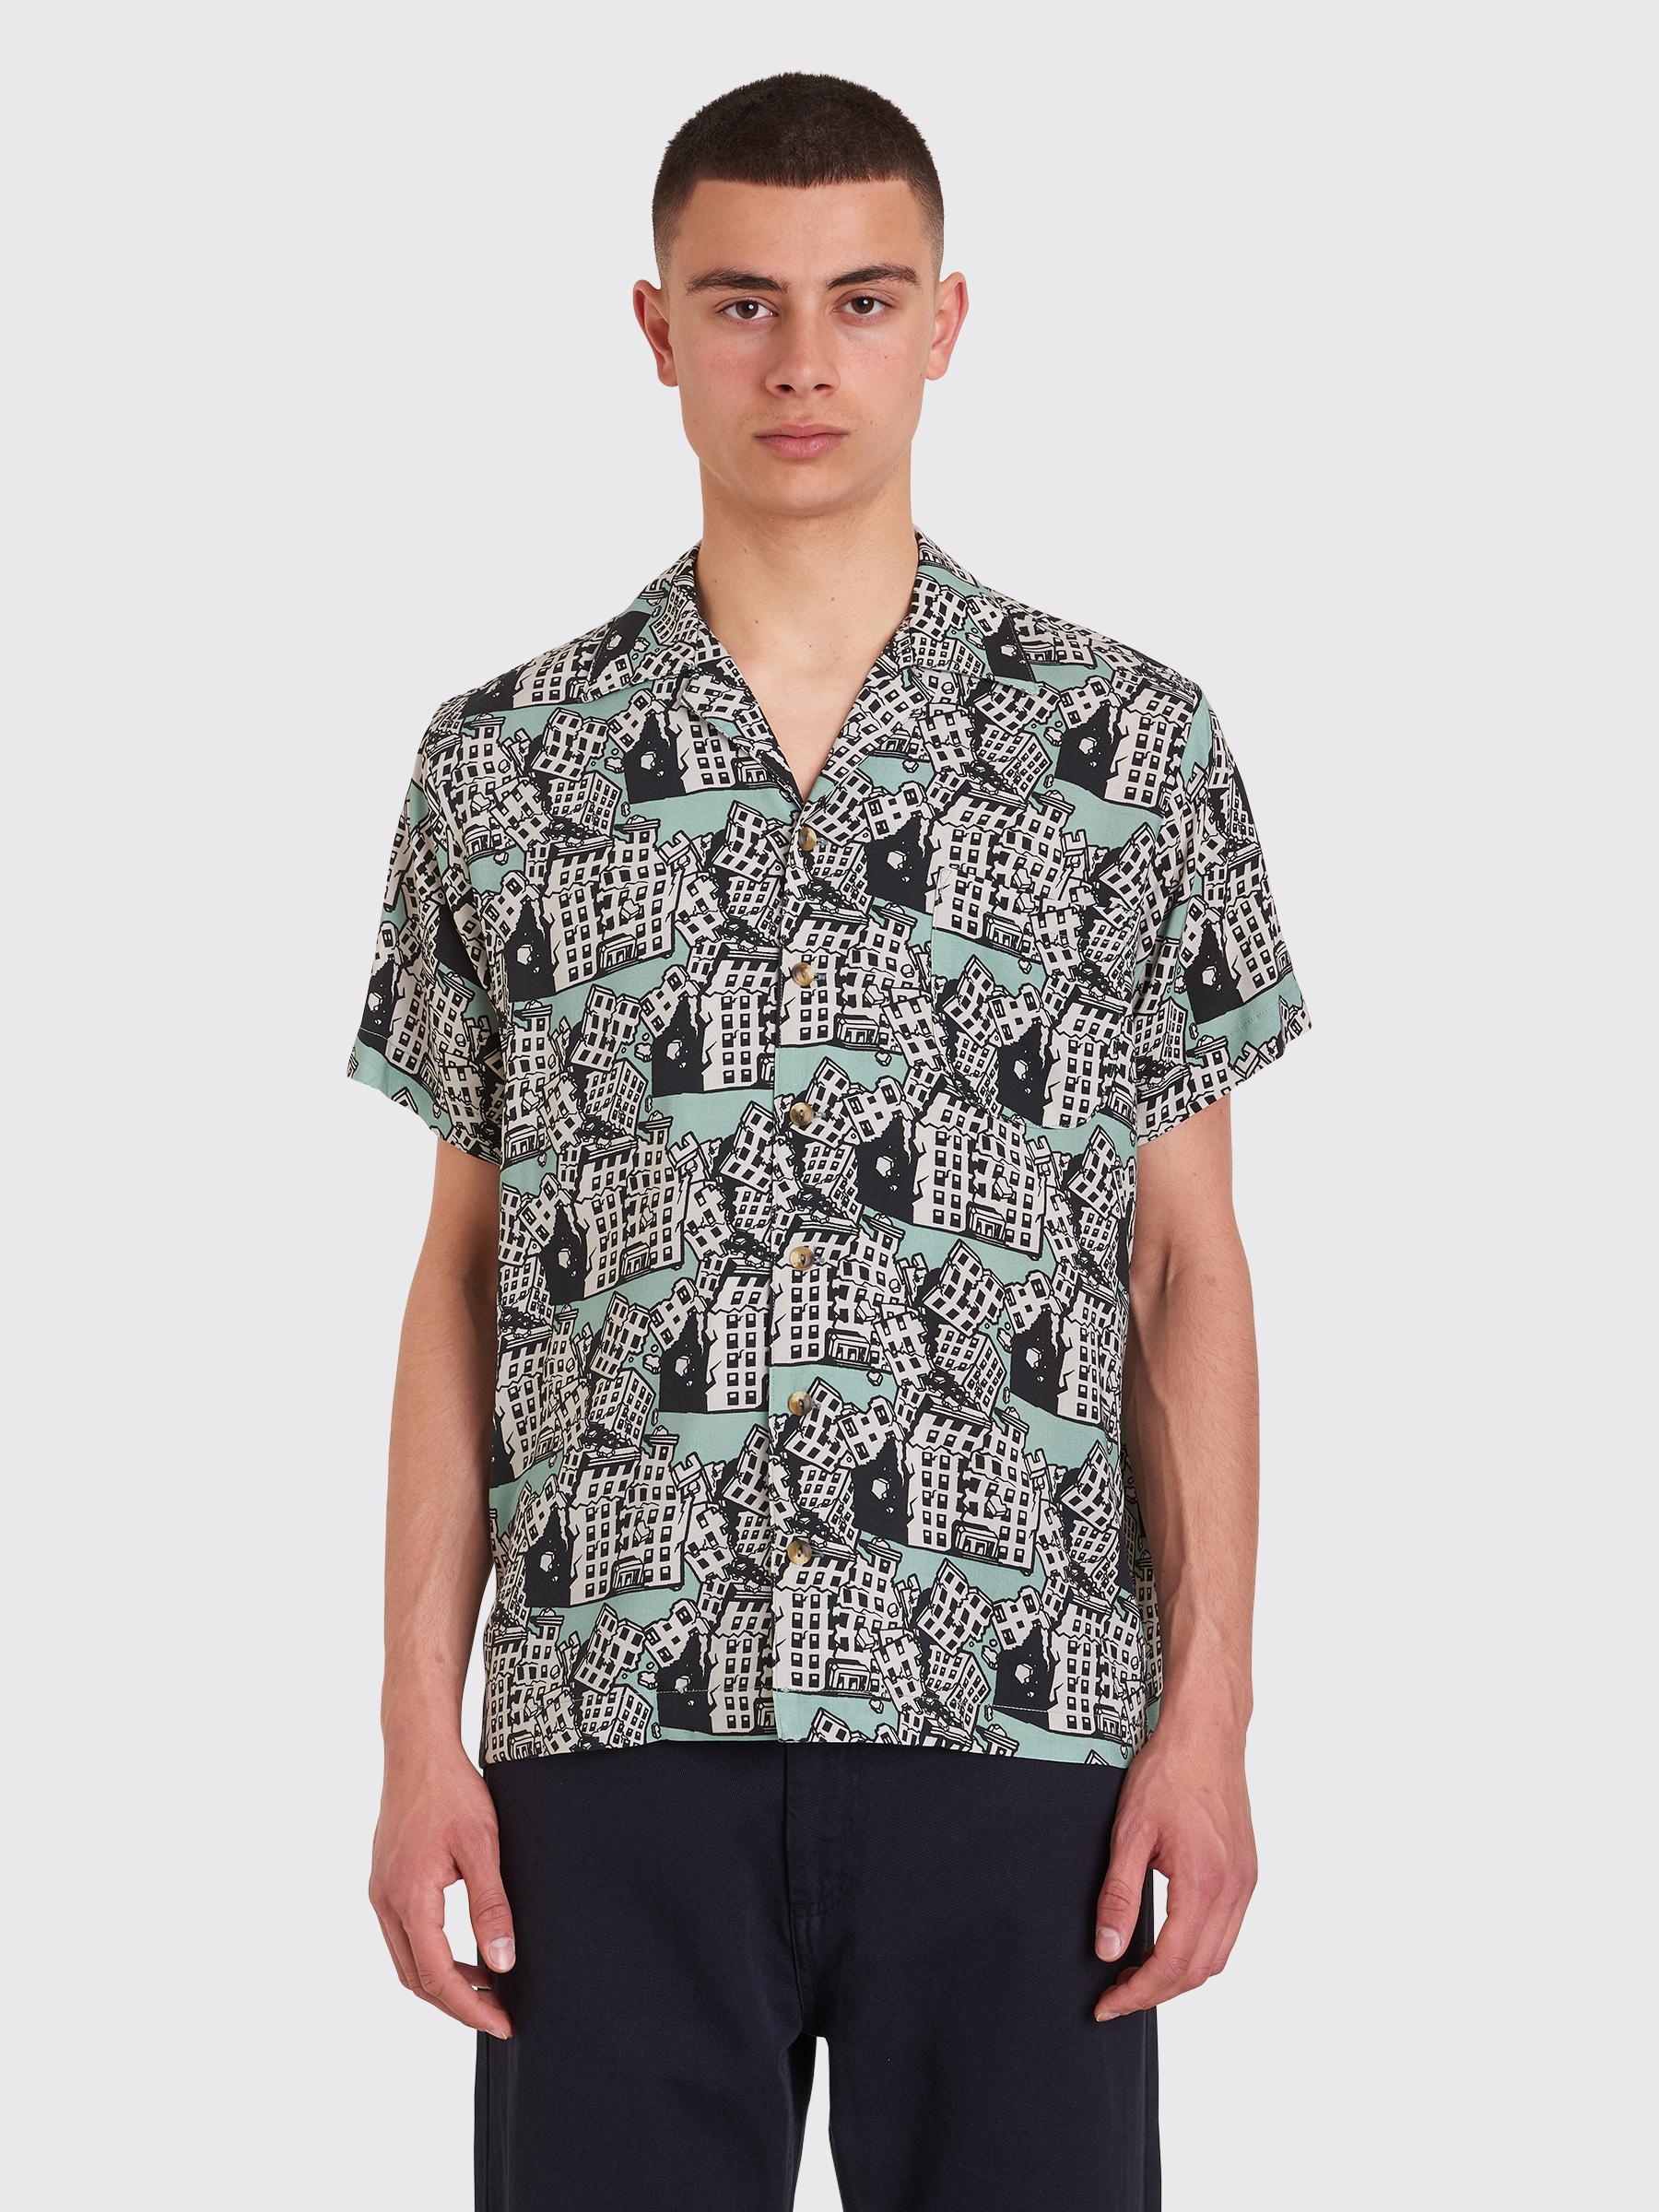 b20d40b4d49 Très Bien - Brain Dead Aloha Buildings Shirt Mint   Black